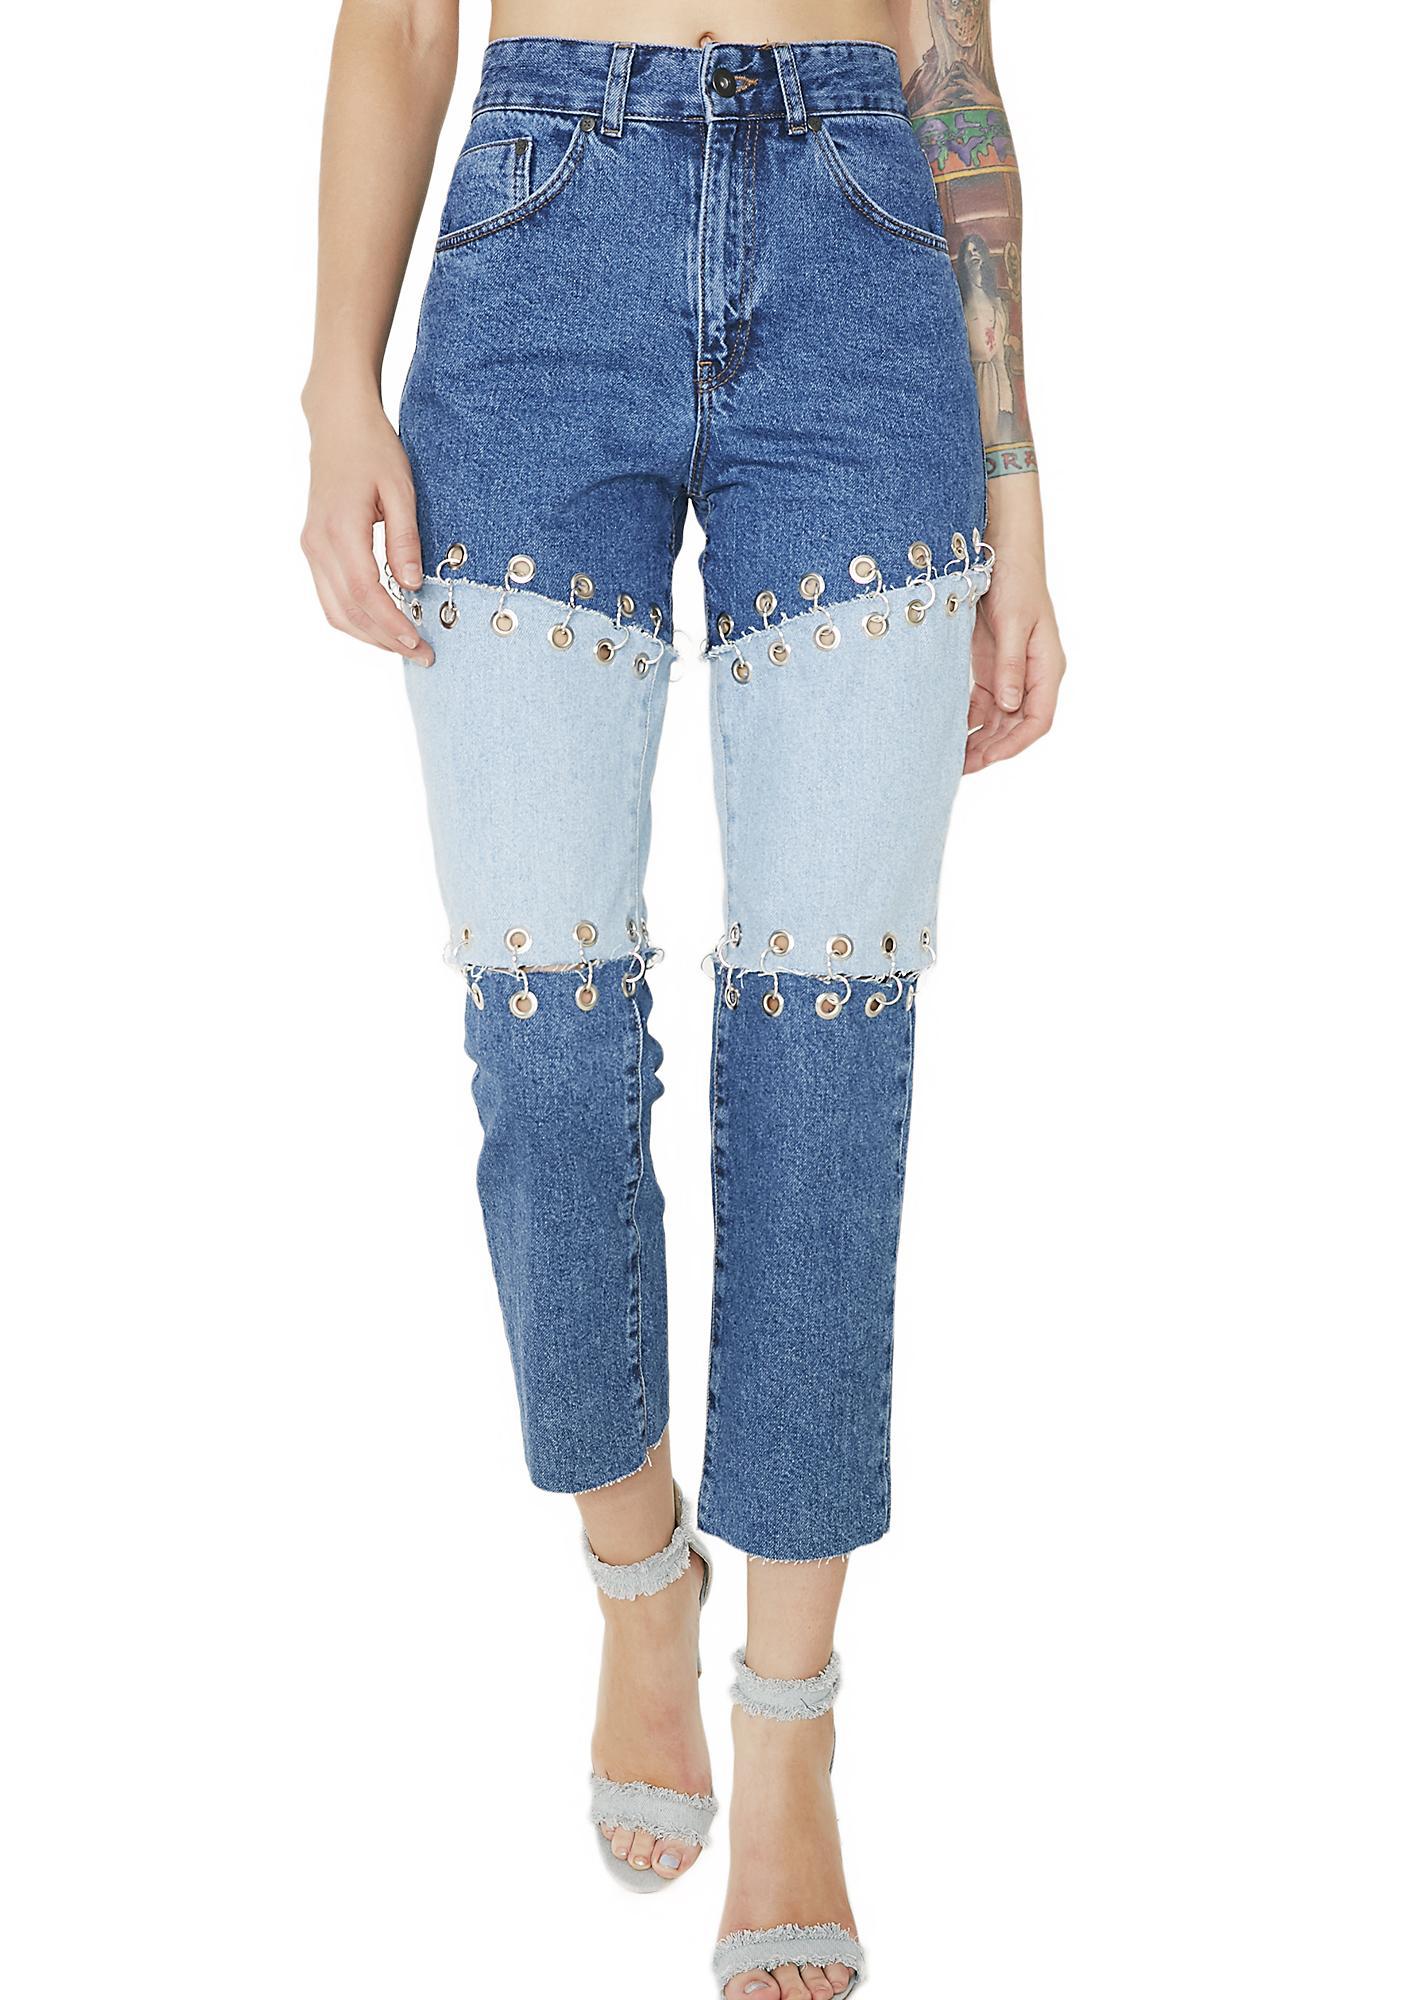 The Ragged Priest Split Jeans